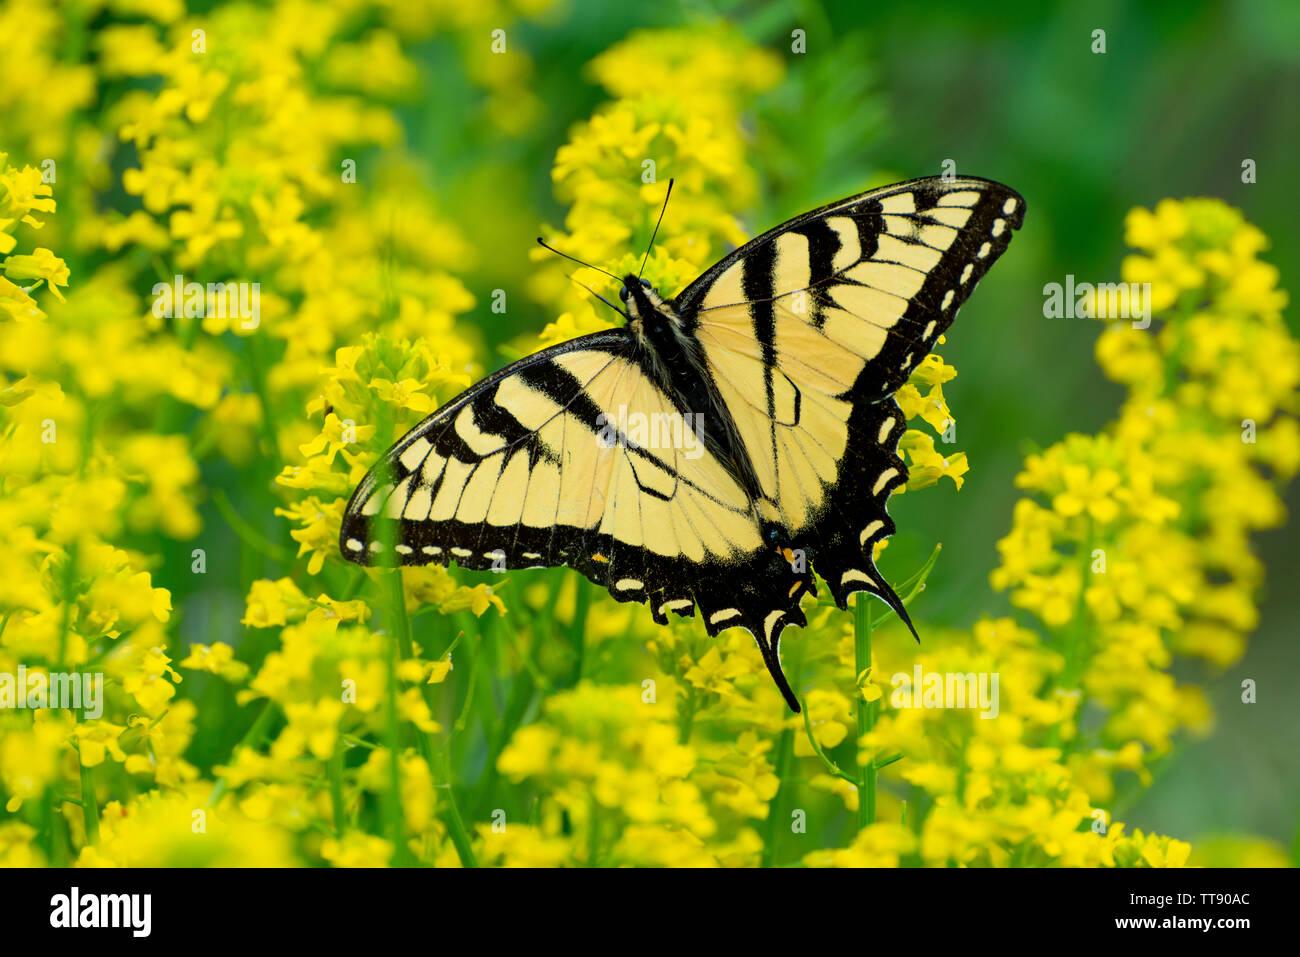 Disparo Horizontal De Una Hermosa Mariposa Papilio